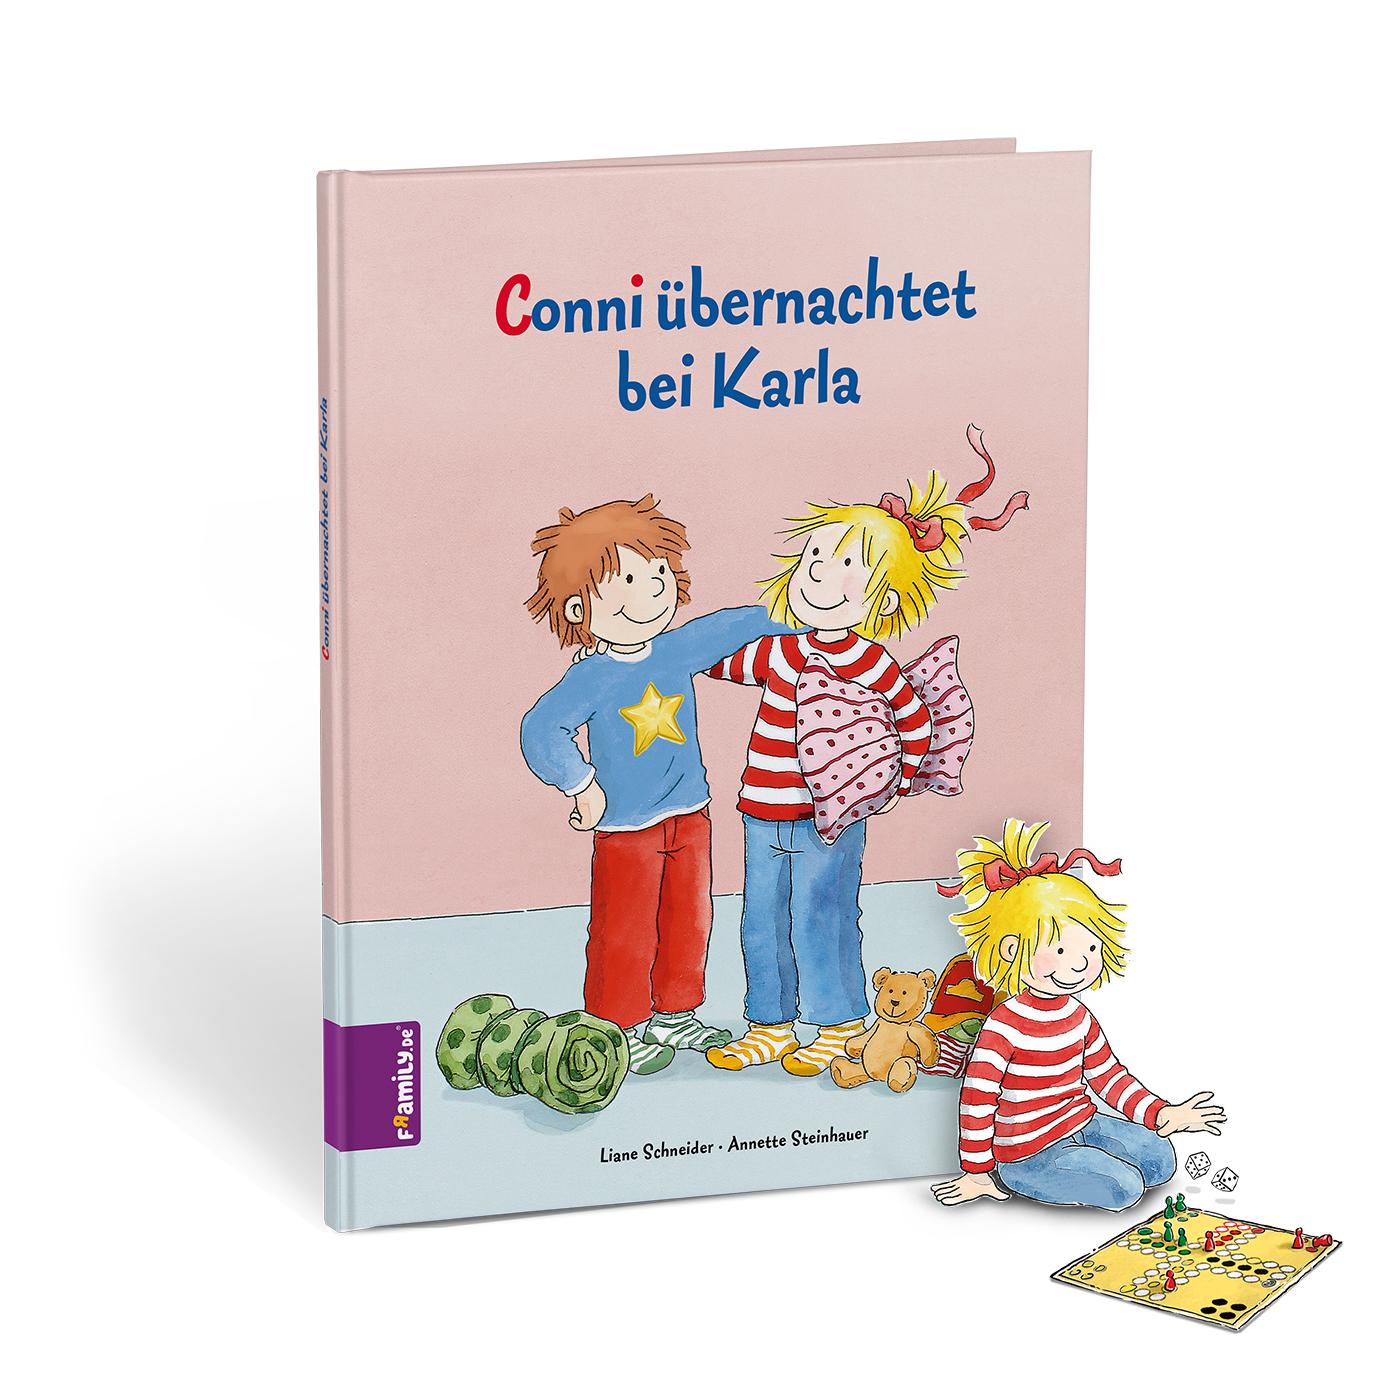 Conni - personalisierte Kinderbuecher